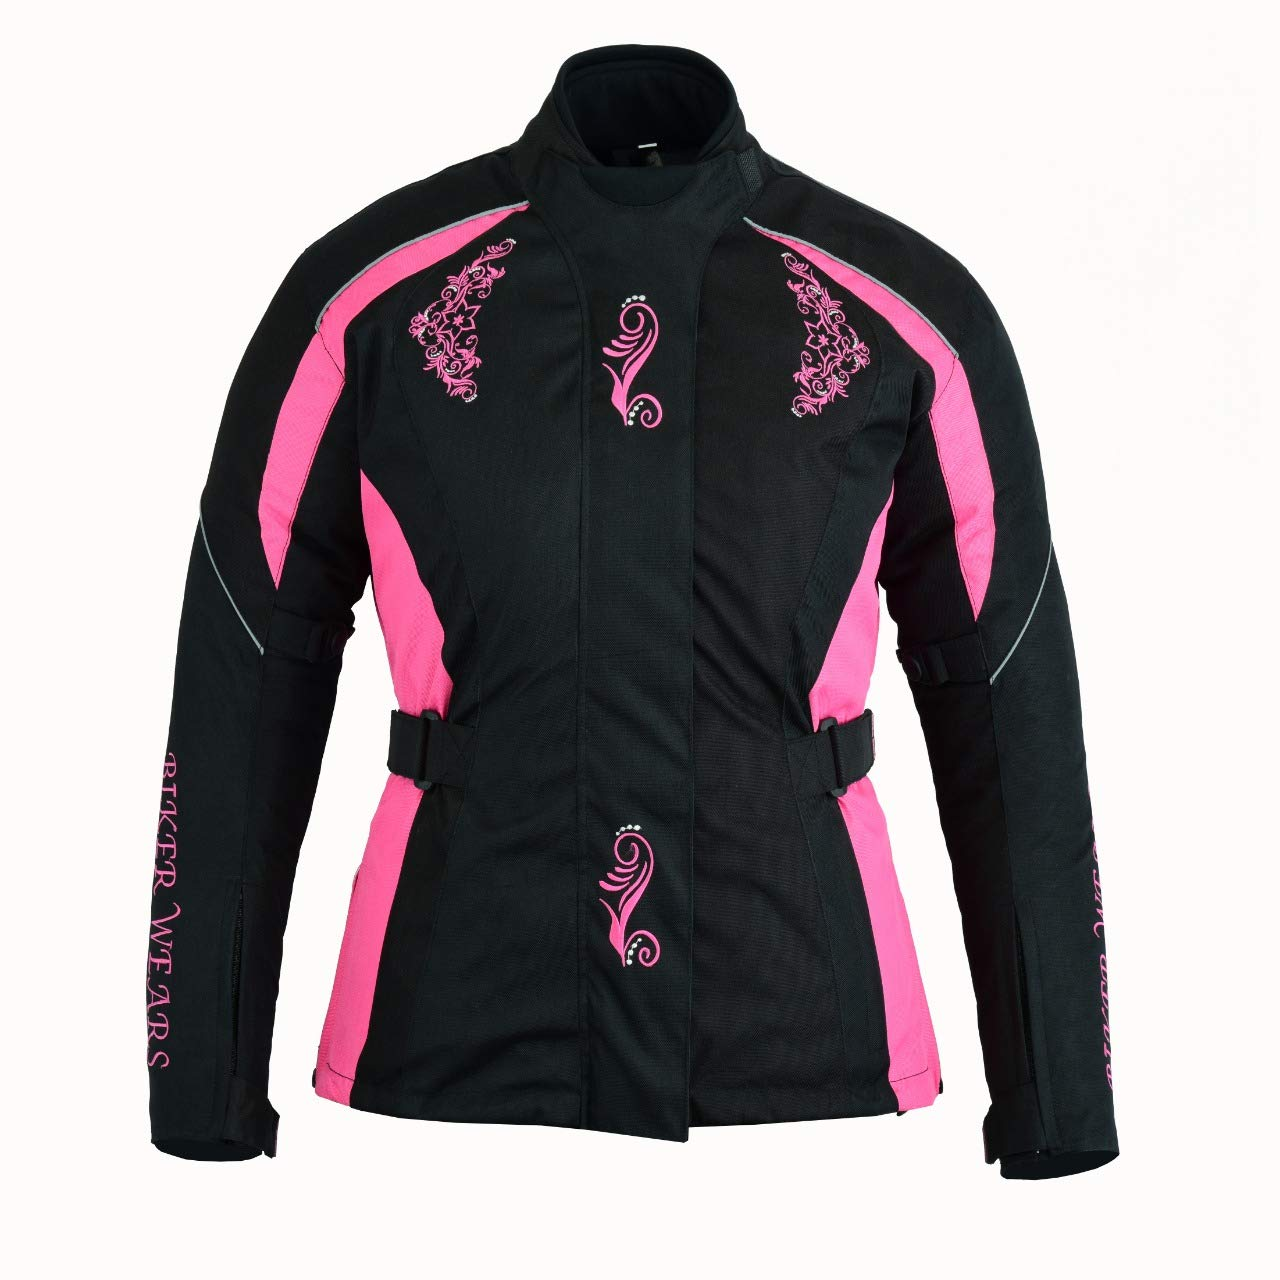 Sarfaraz World Se/ñoras Moto Moto Scooter Impermeable Textil Rosa Chaqueta blindada protectora de seguridad